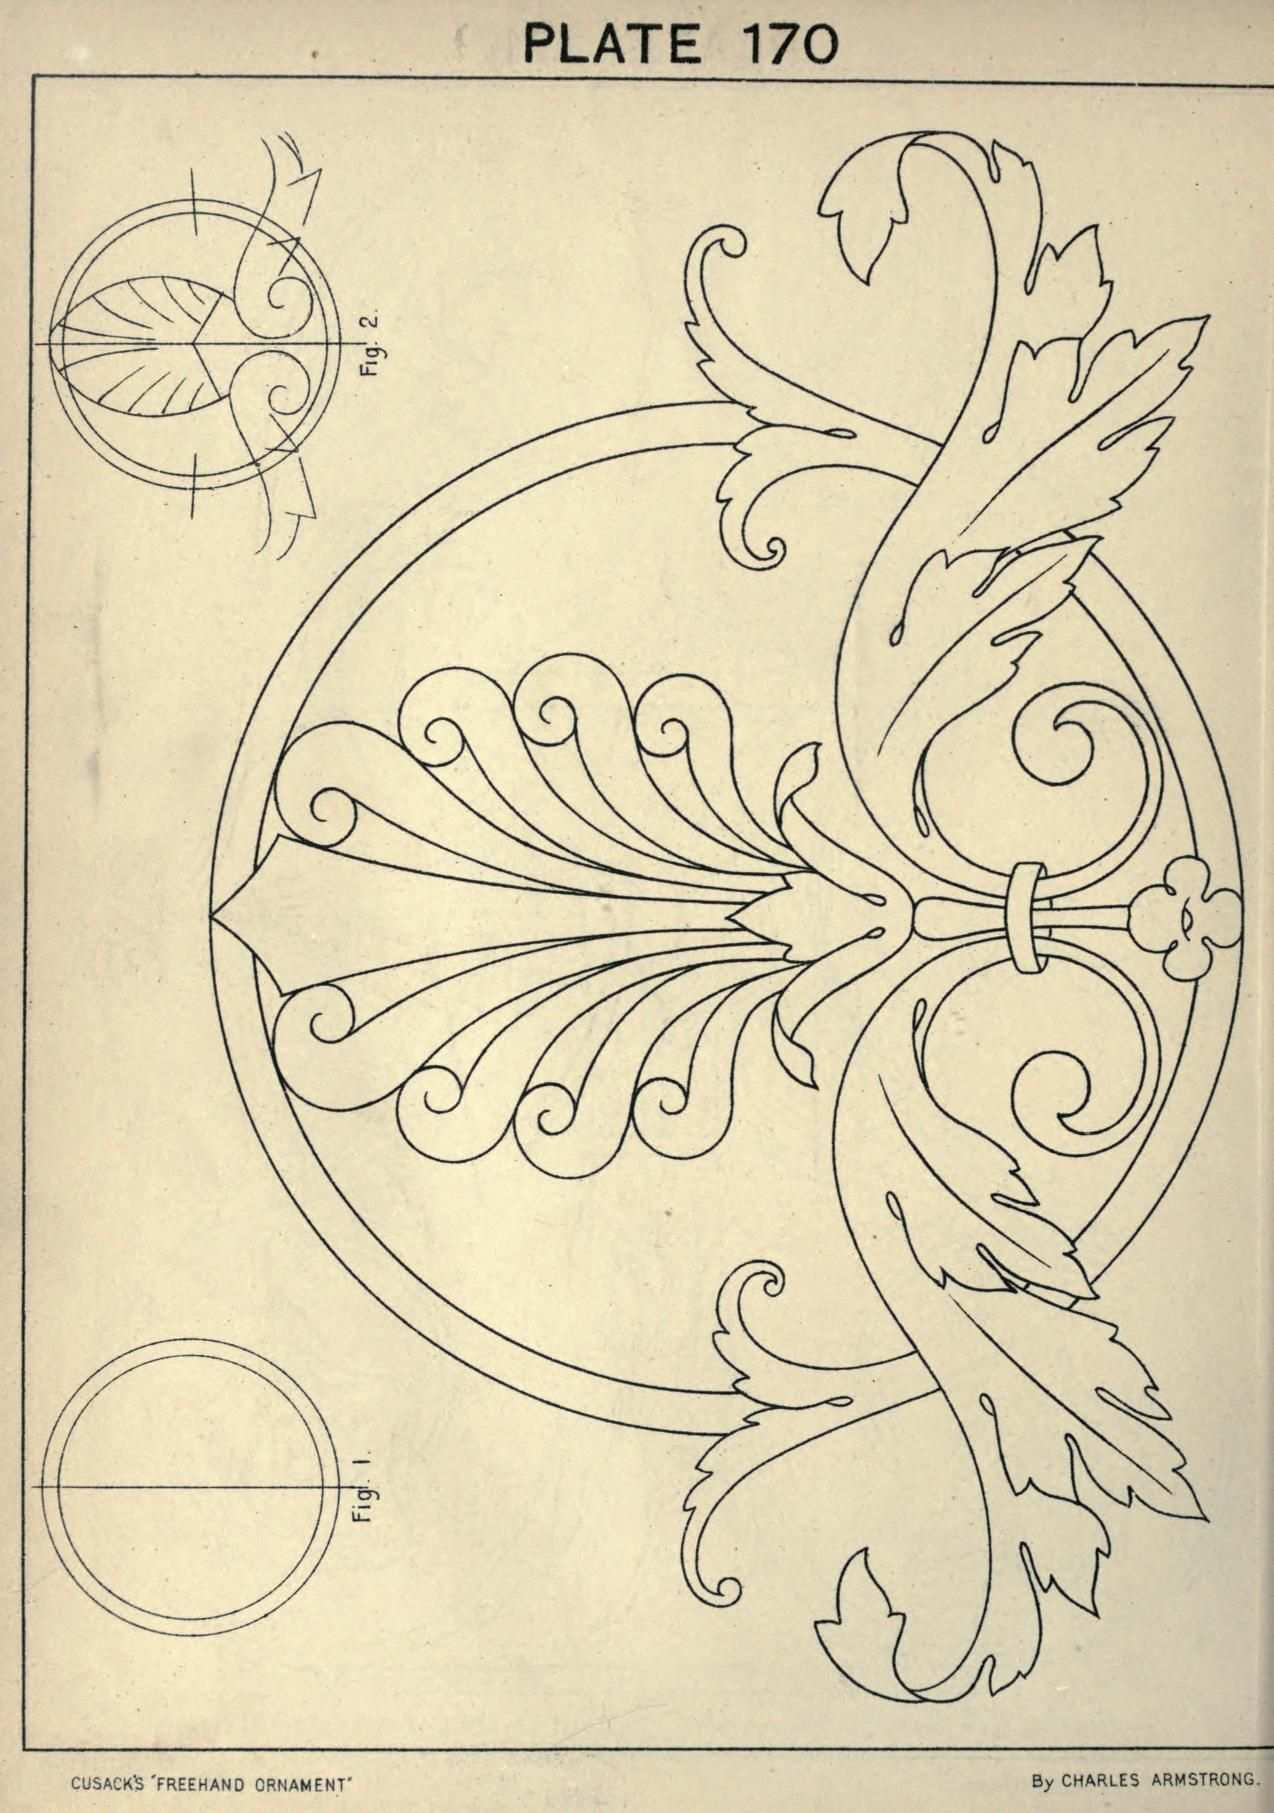 Cusack S Freehand Ornament A Text Book With Ch Shablony Trafaretov